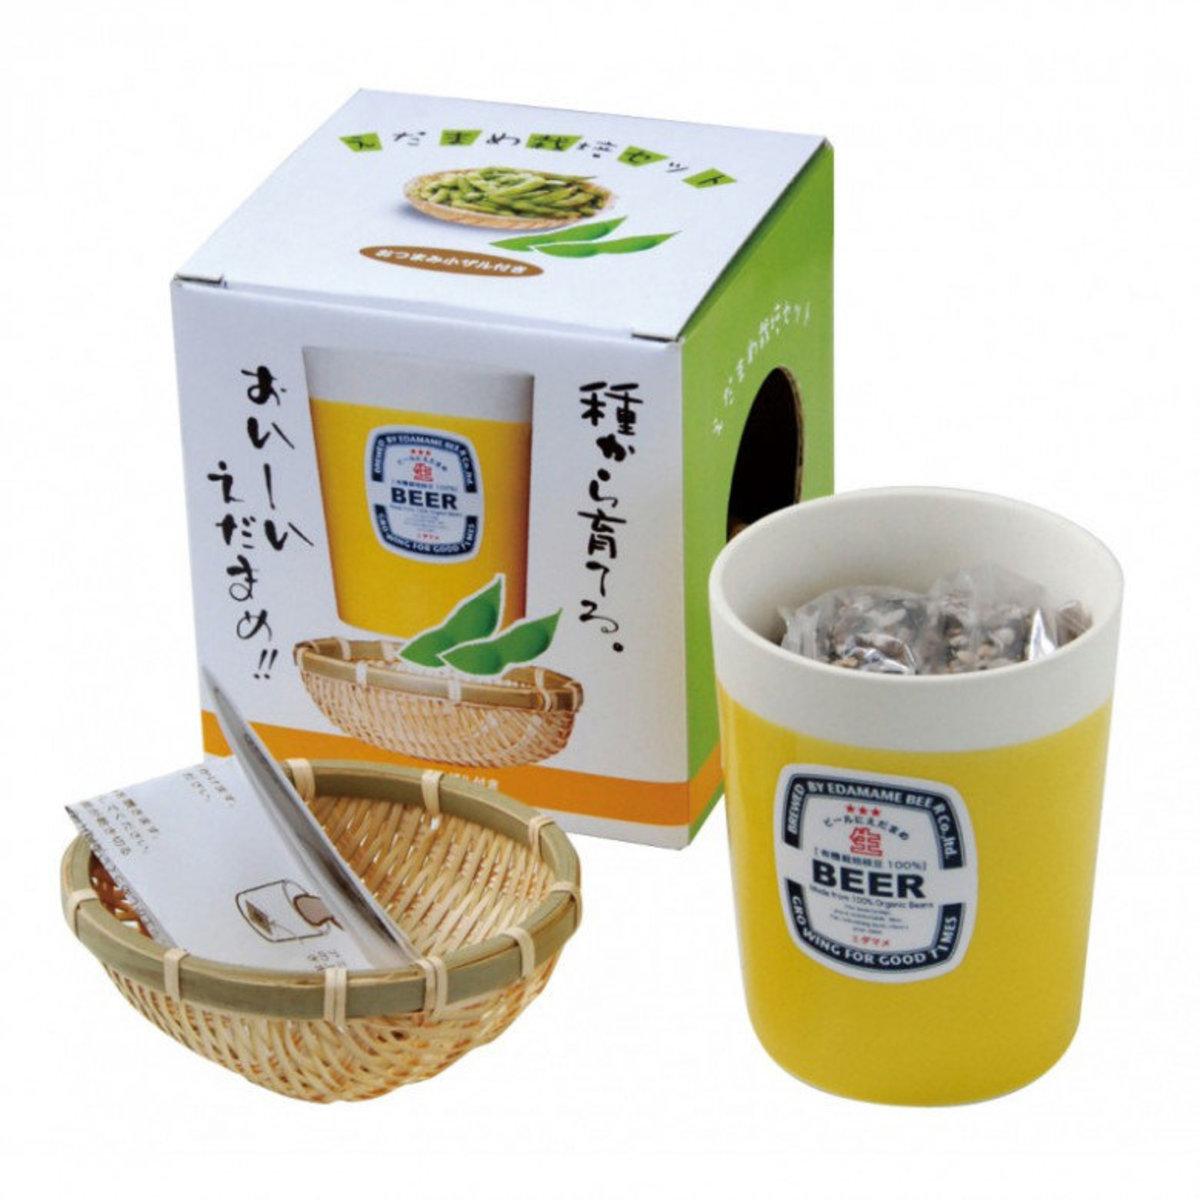 Edamame 盆栽 - 枝豆